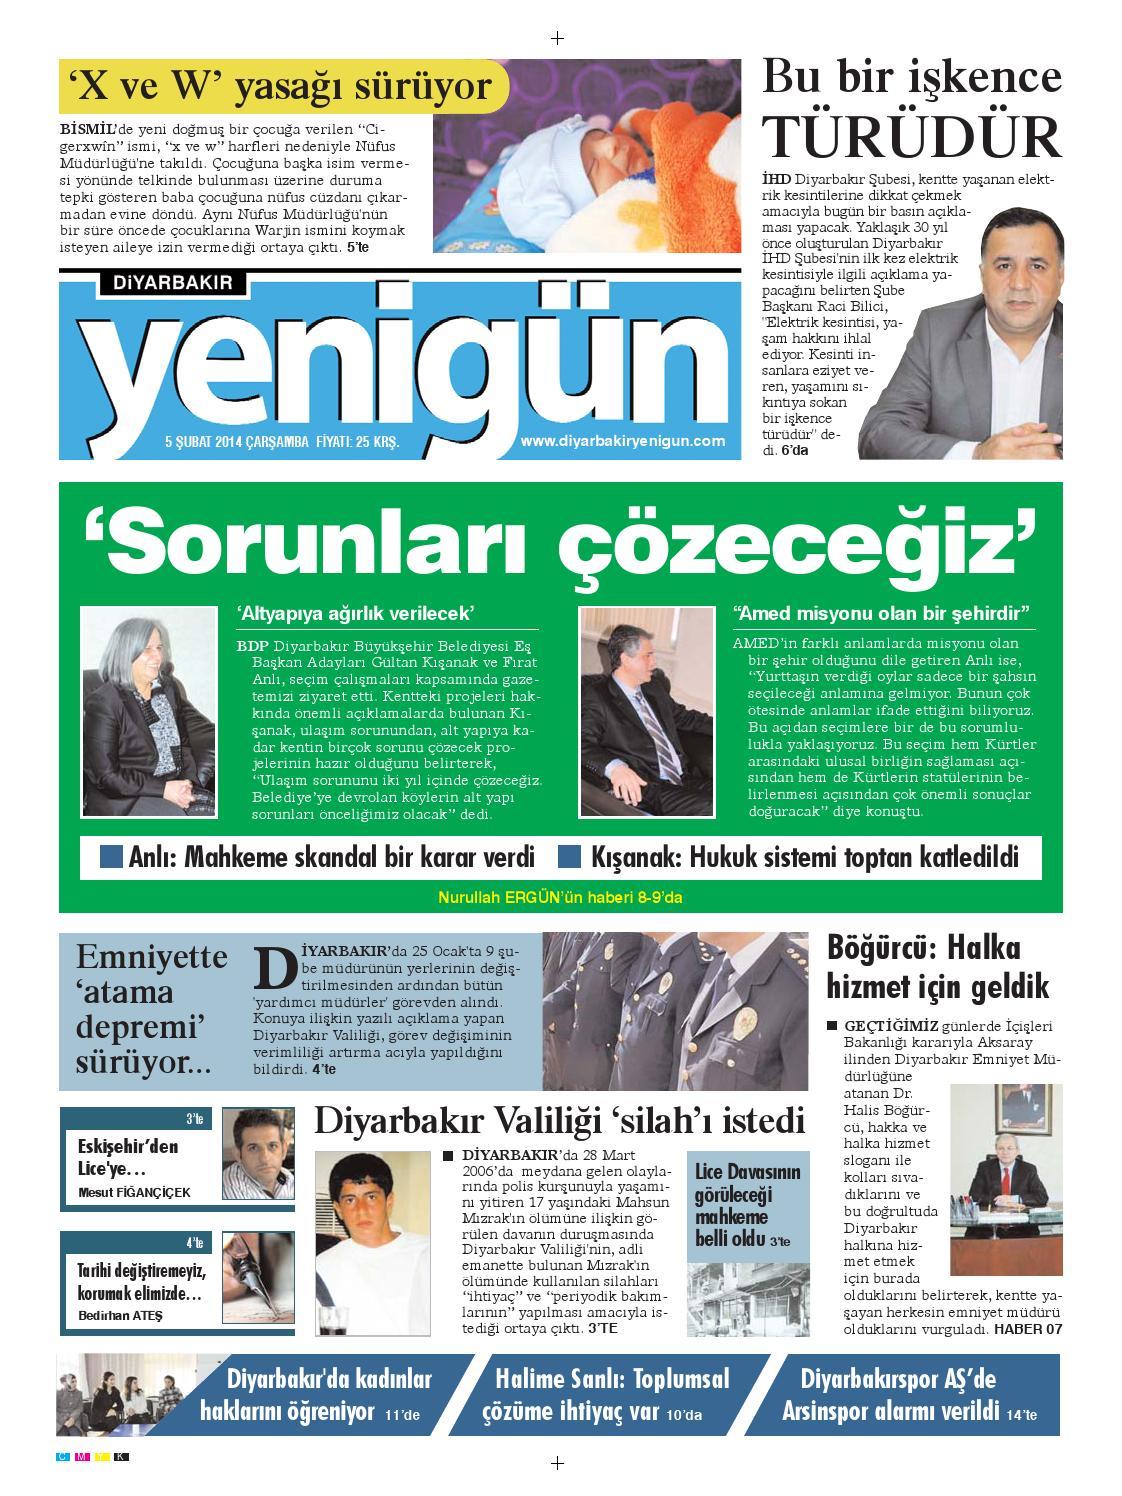 Diyarbakir Yenigun Gazetesi By Osman Ergun Issuu